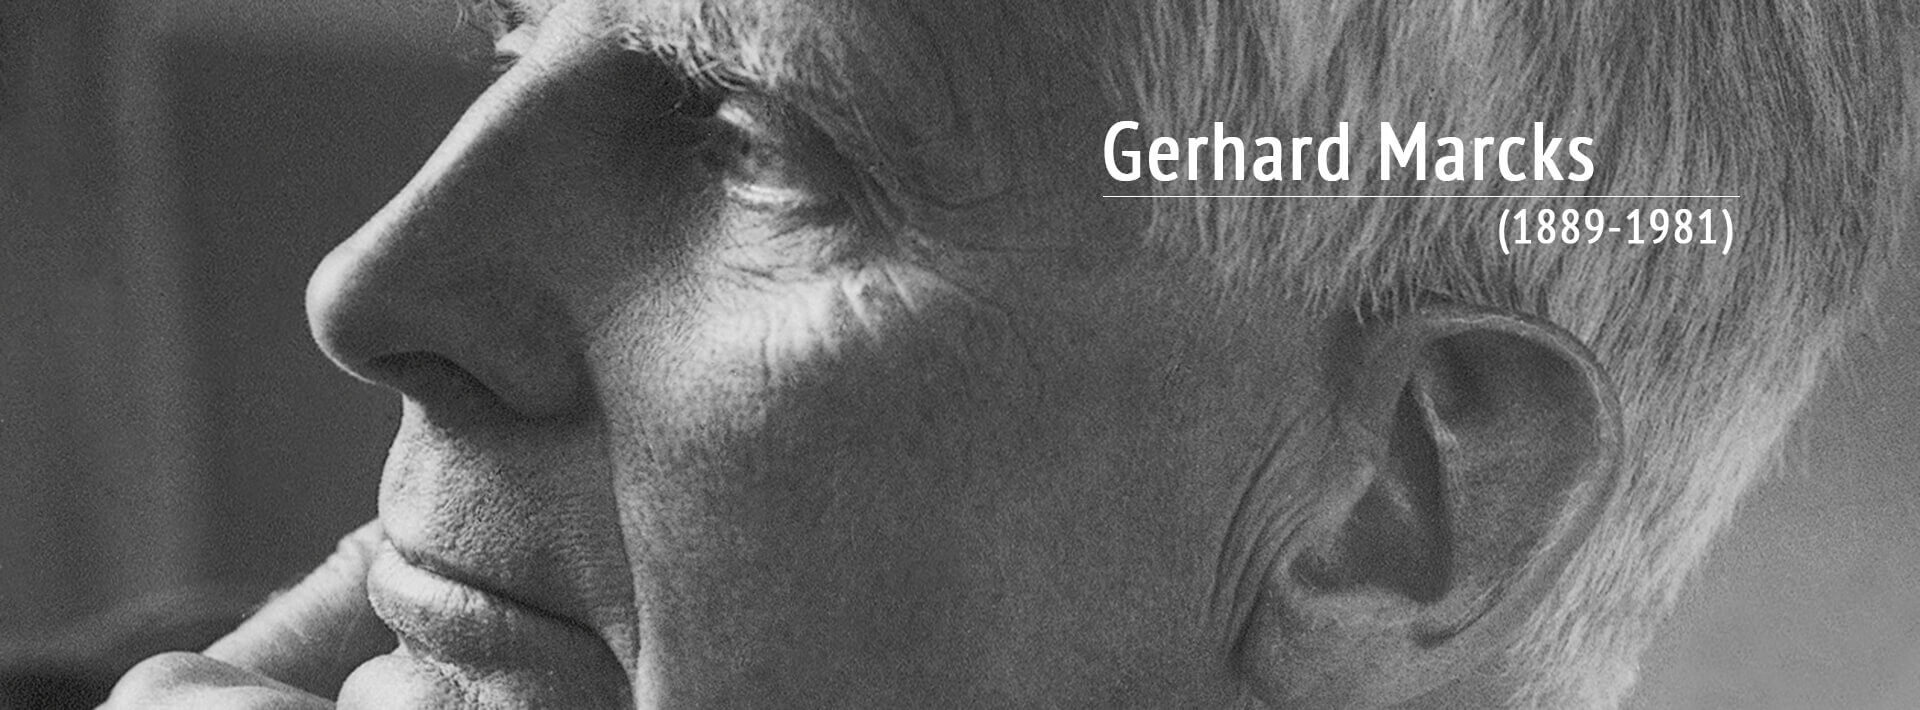 Gerhard Marcks (1889-1981)